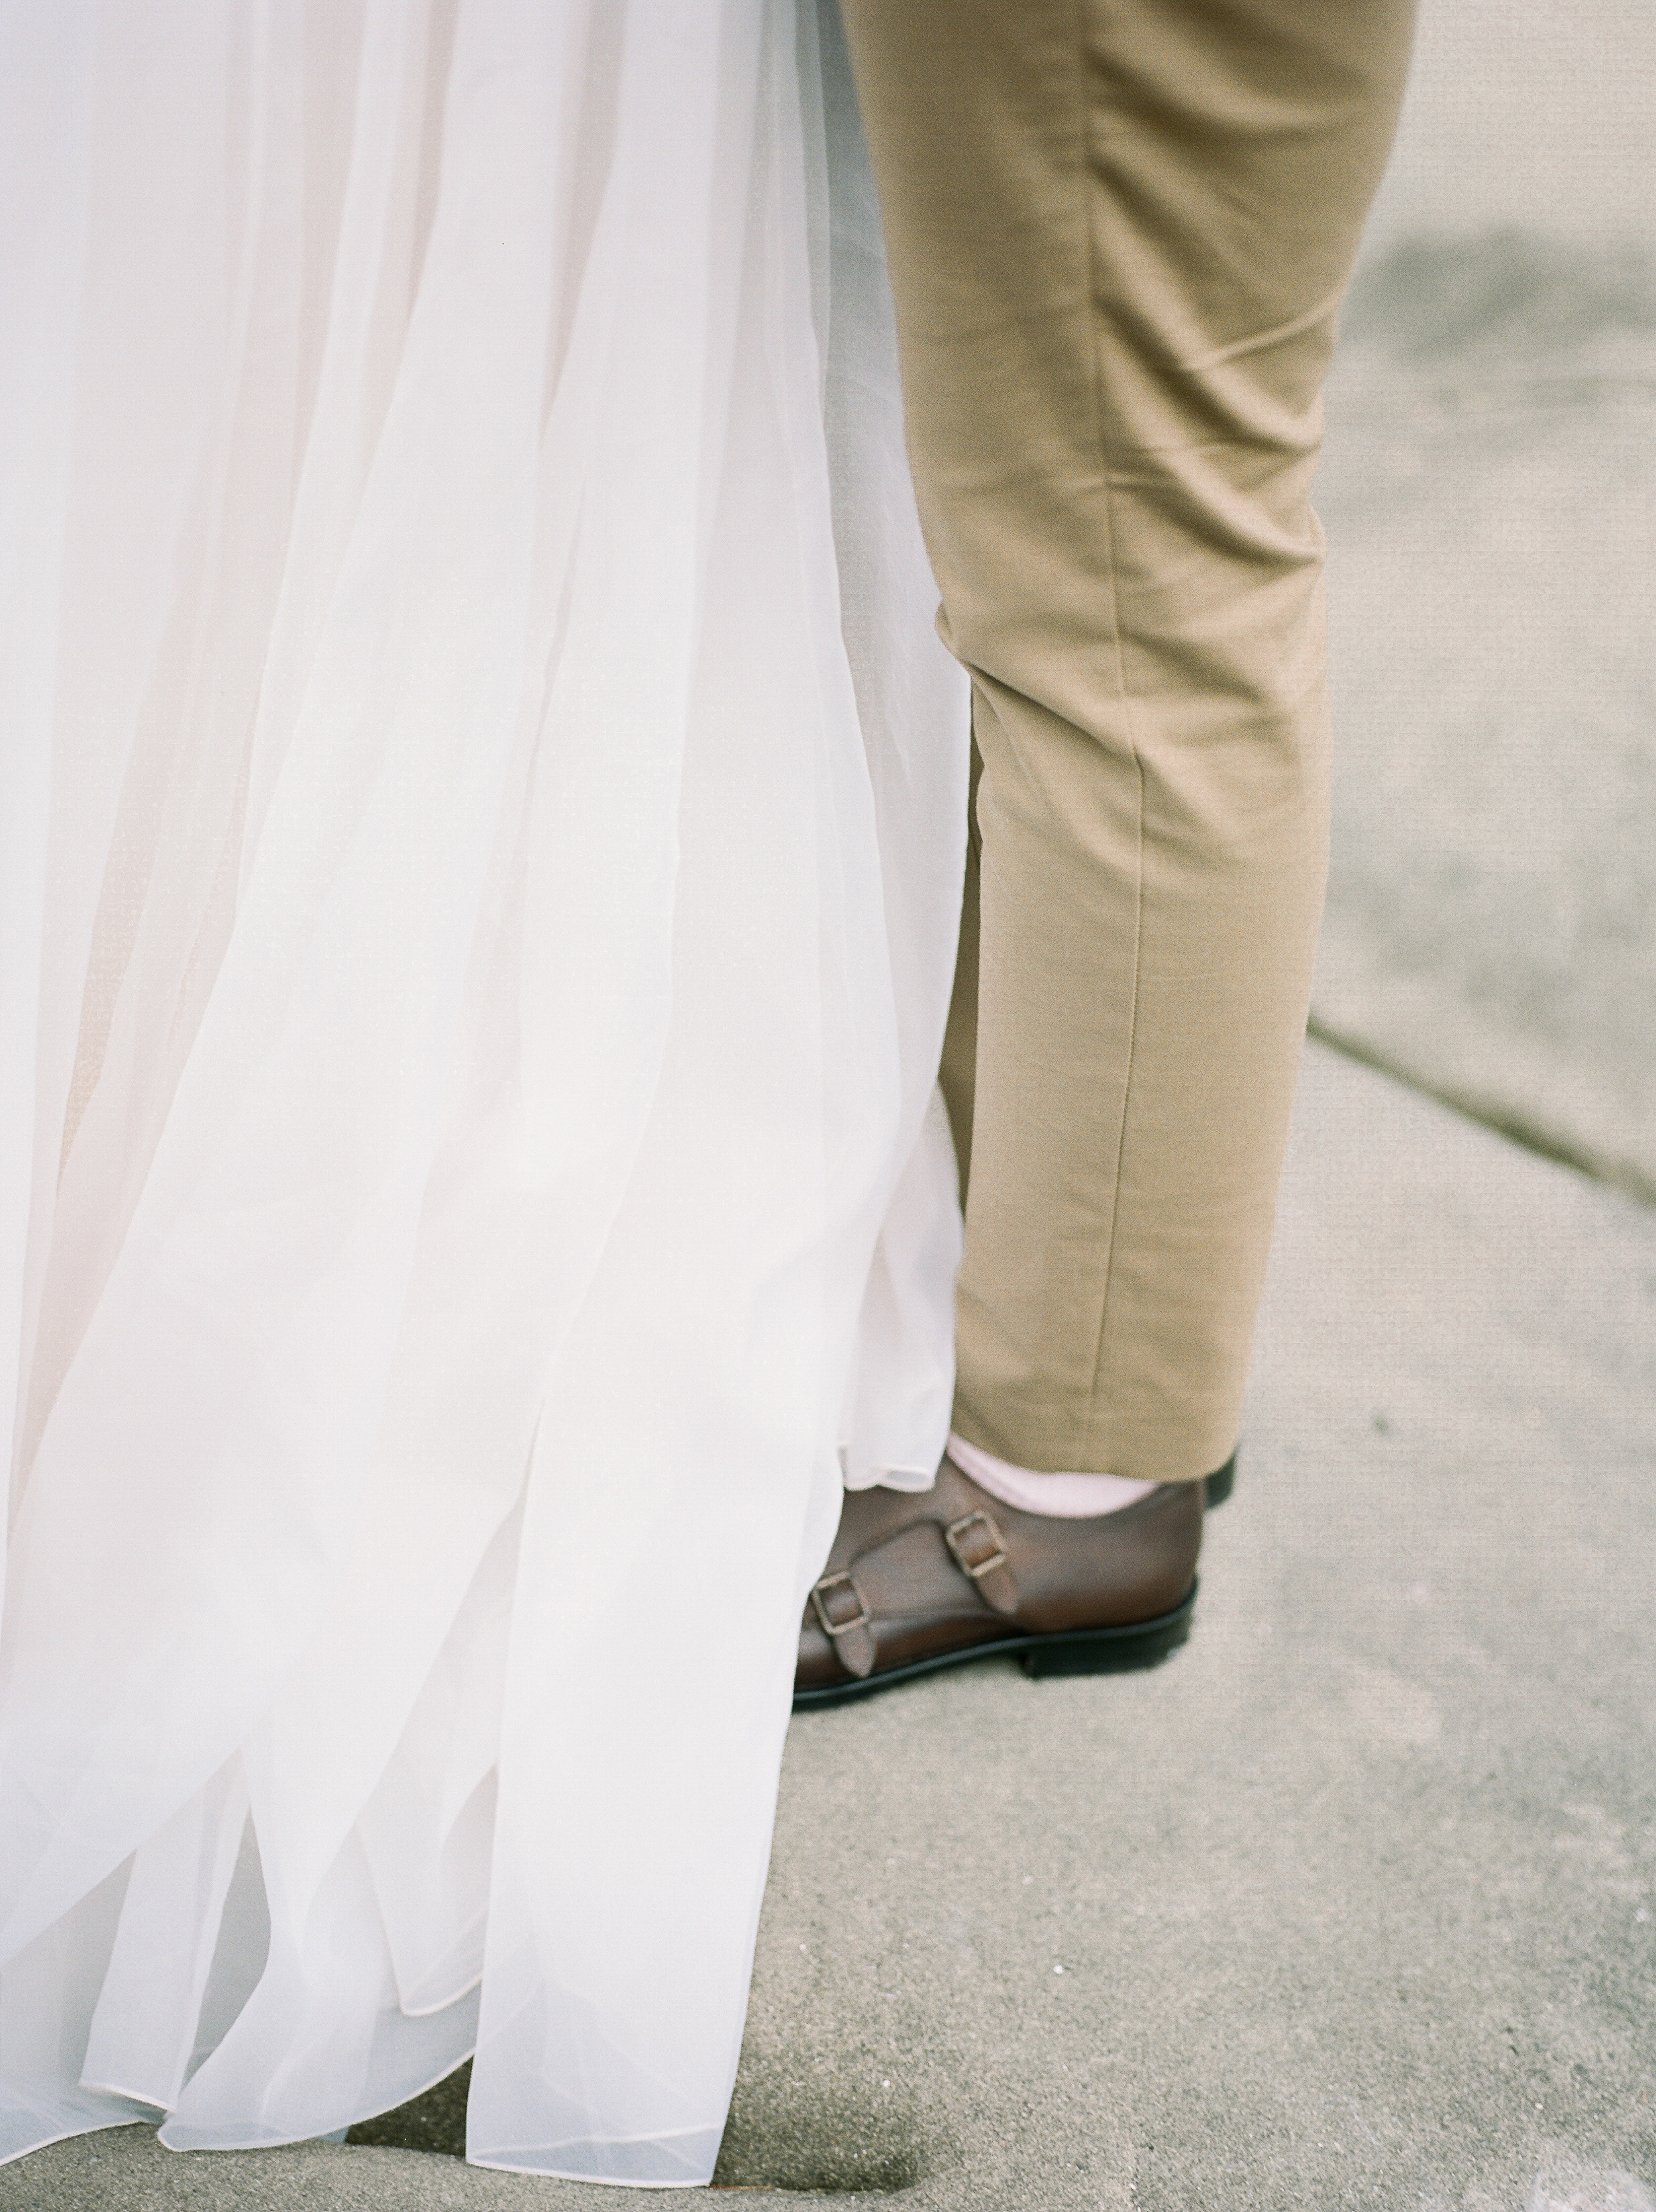 Galiano Island Wedding Photographer, Bodega Ridge Wedding, Vancouver Wedding Photographer, Canadian Wedding Photographer, Vancouver Island Wedding, Tofino Wedding, Fine Art Film Photographer, Film Wedding Photographer, Canadian Film Photographer